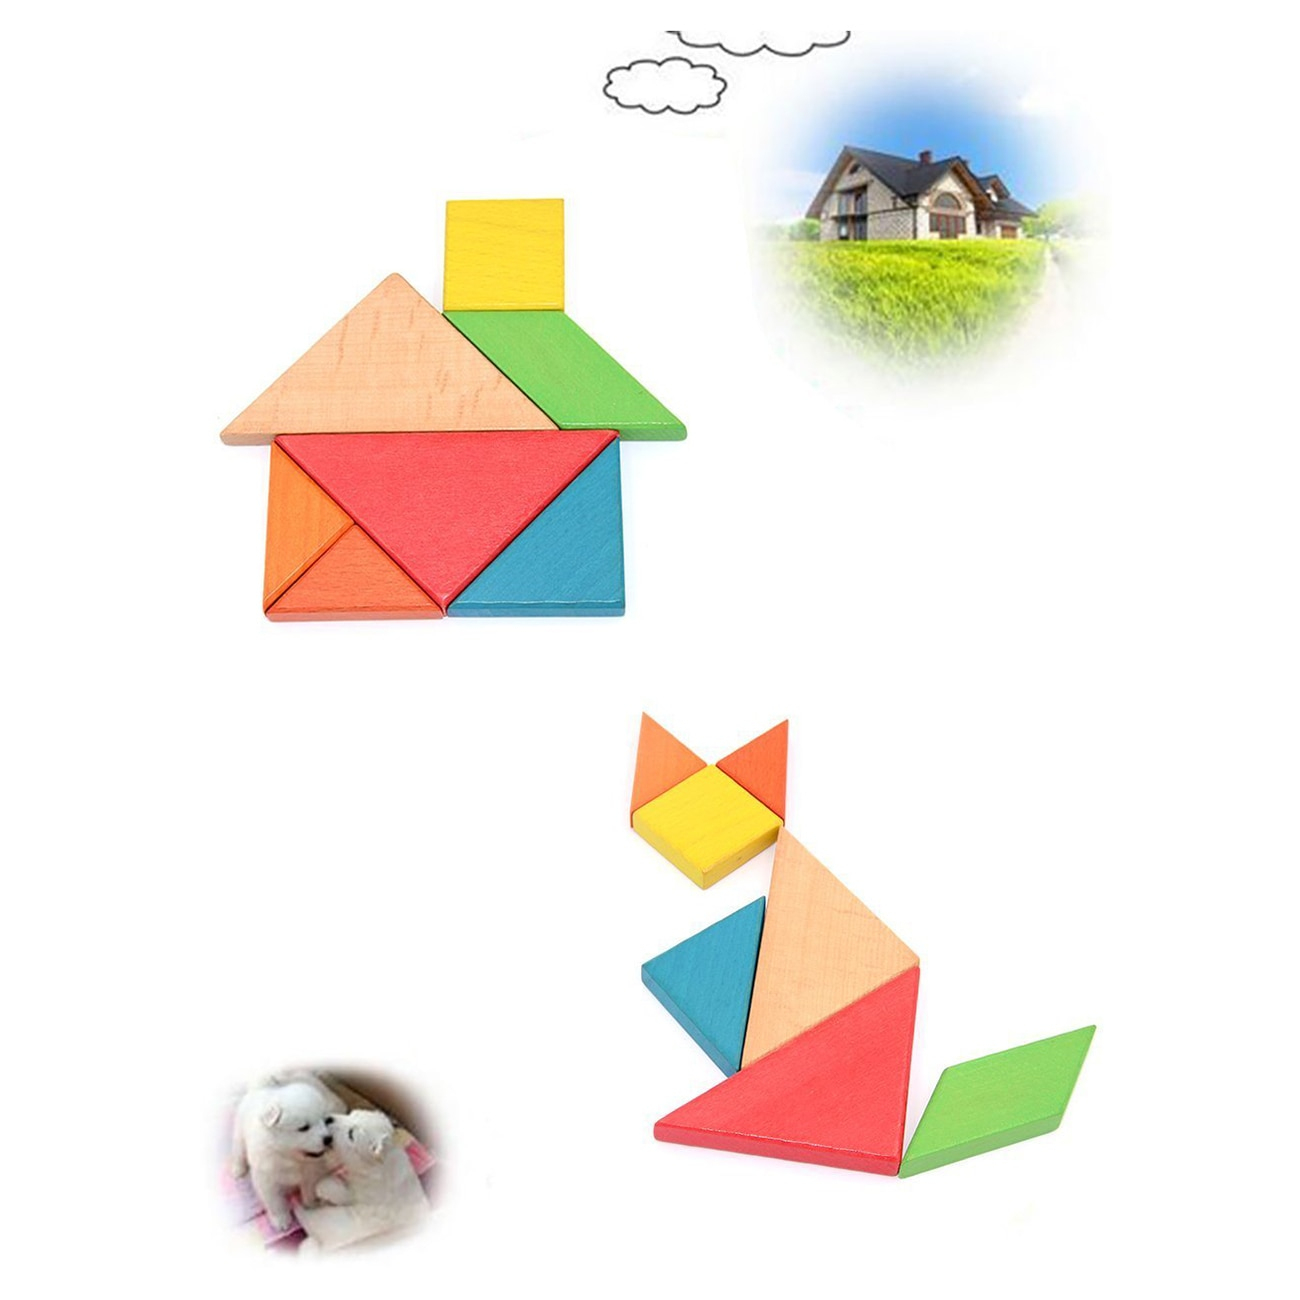 New Colorful Wooden Tangram For Kids Seven Geometric Shapes avec Pièces Tangram